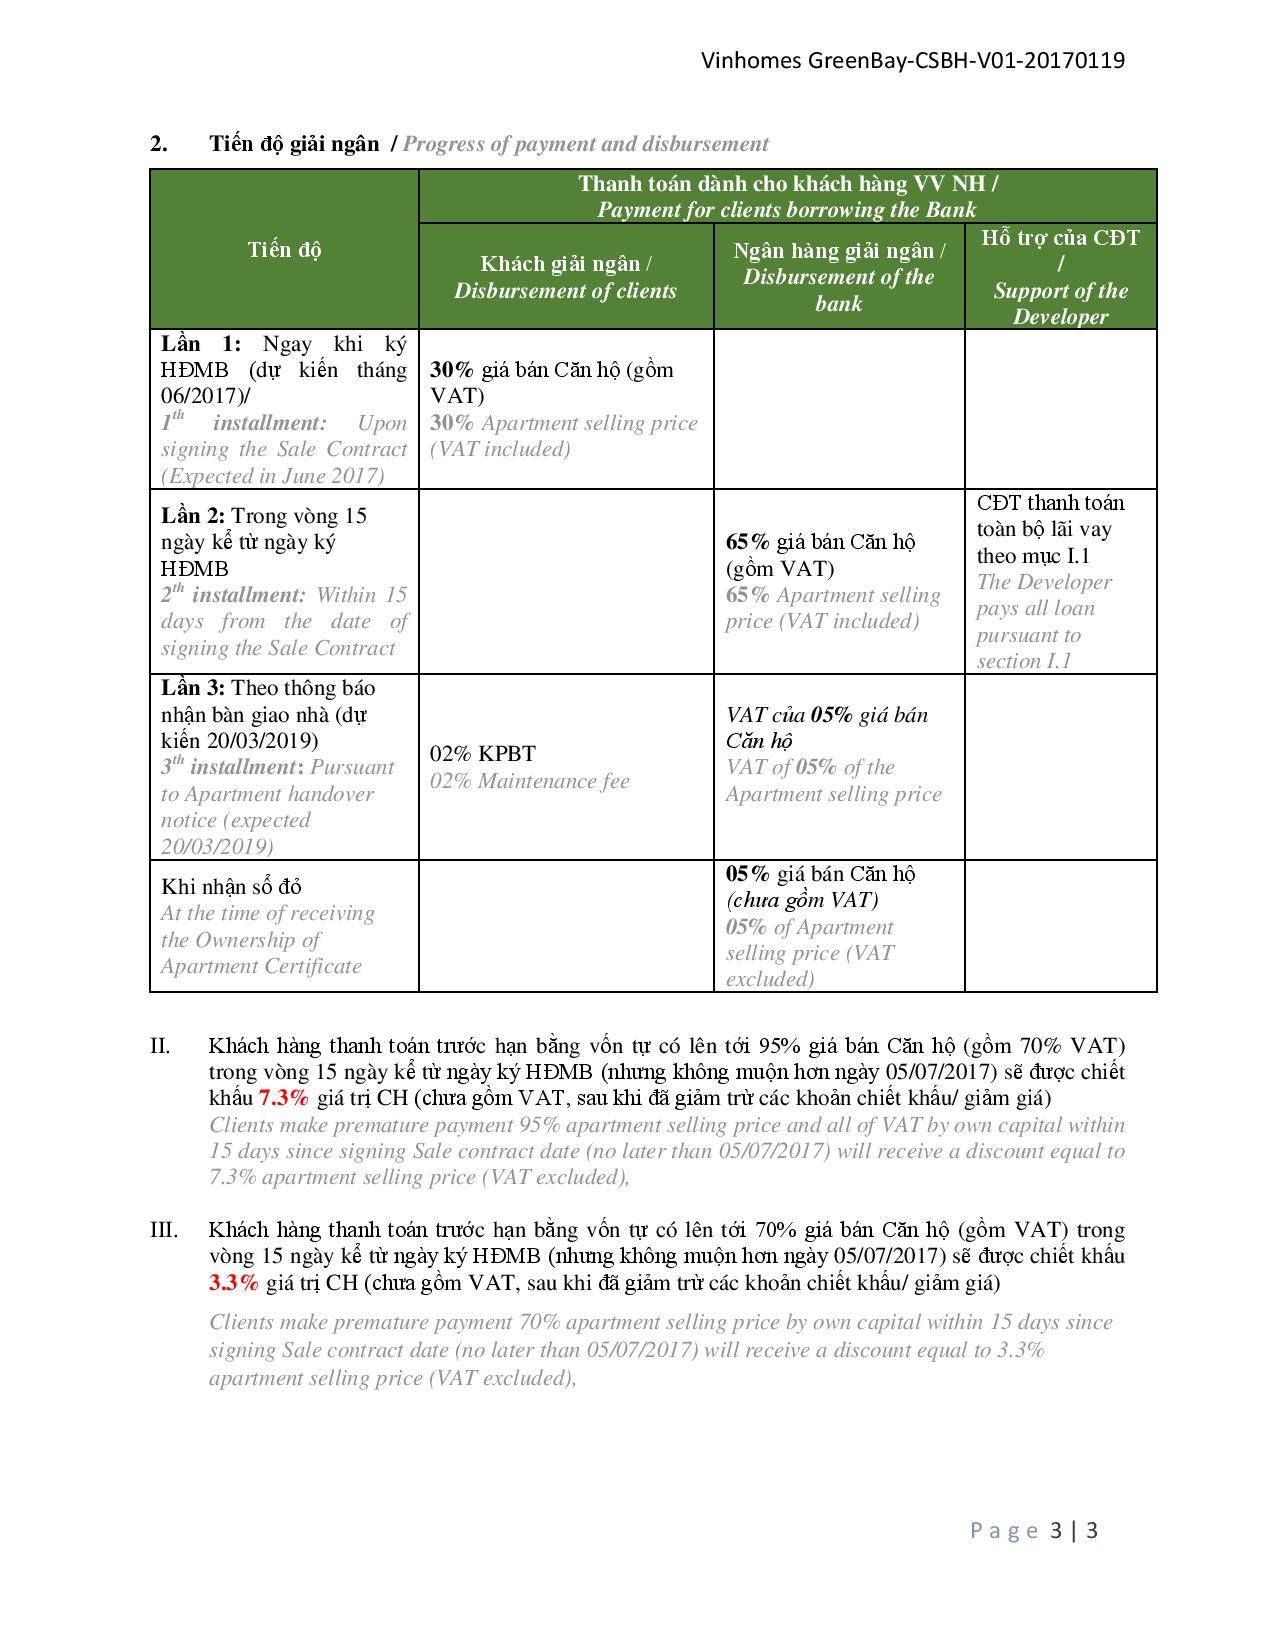 170116-GreenBay-Canho-CSBH_final - KH-page-003